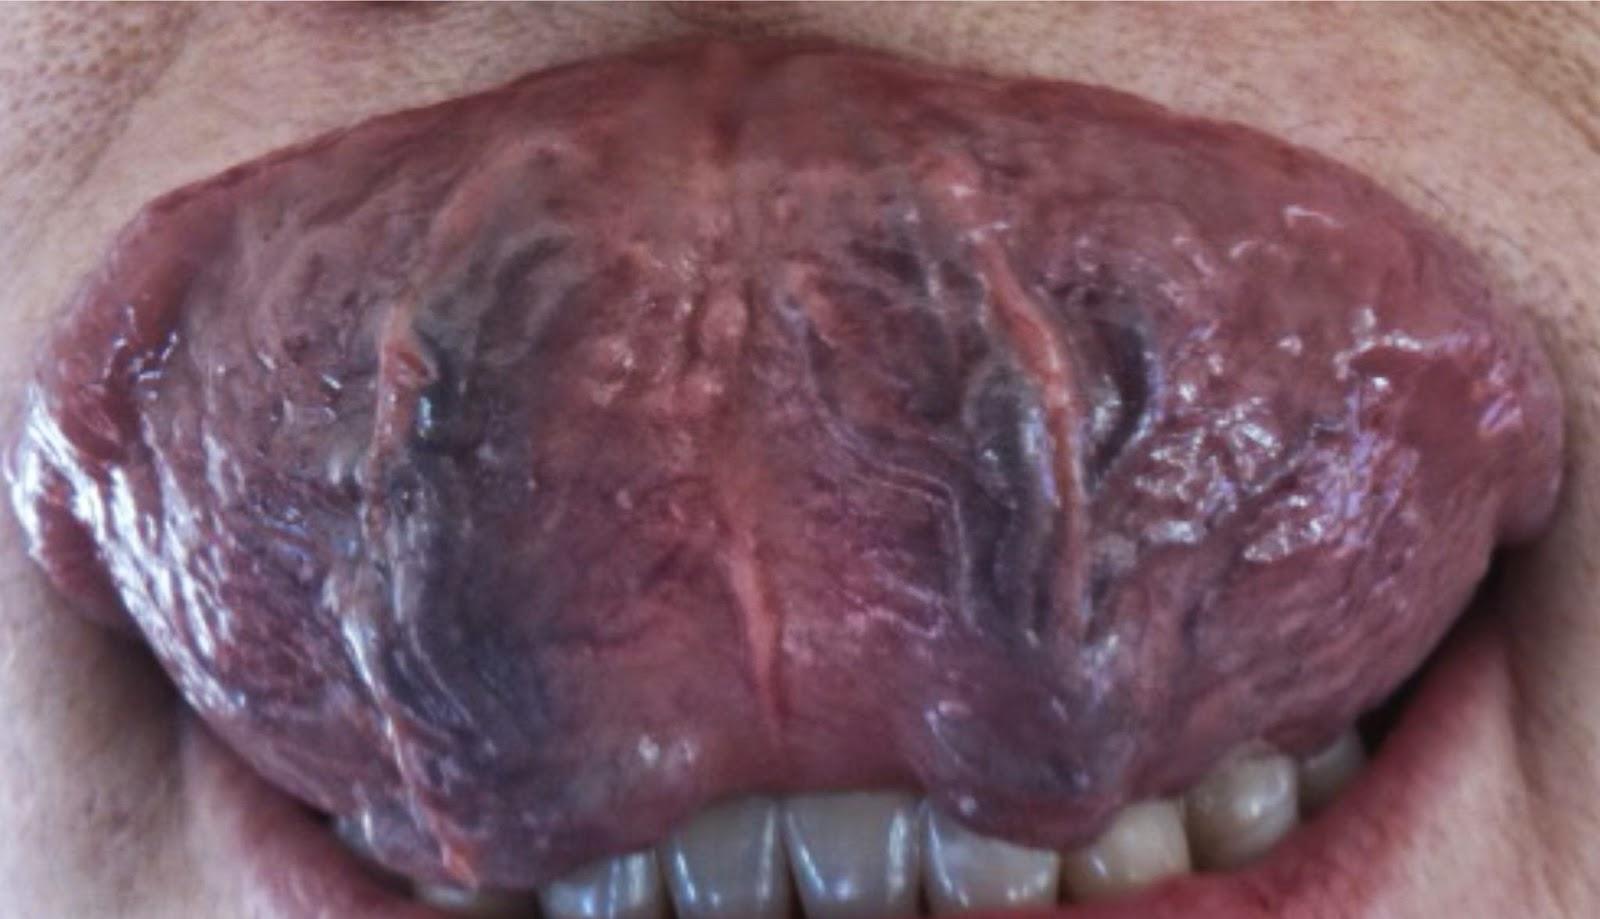 varicose veins in throat